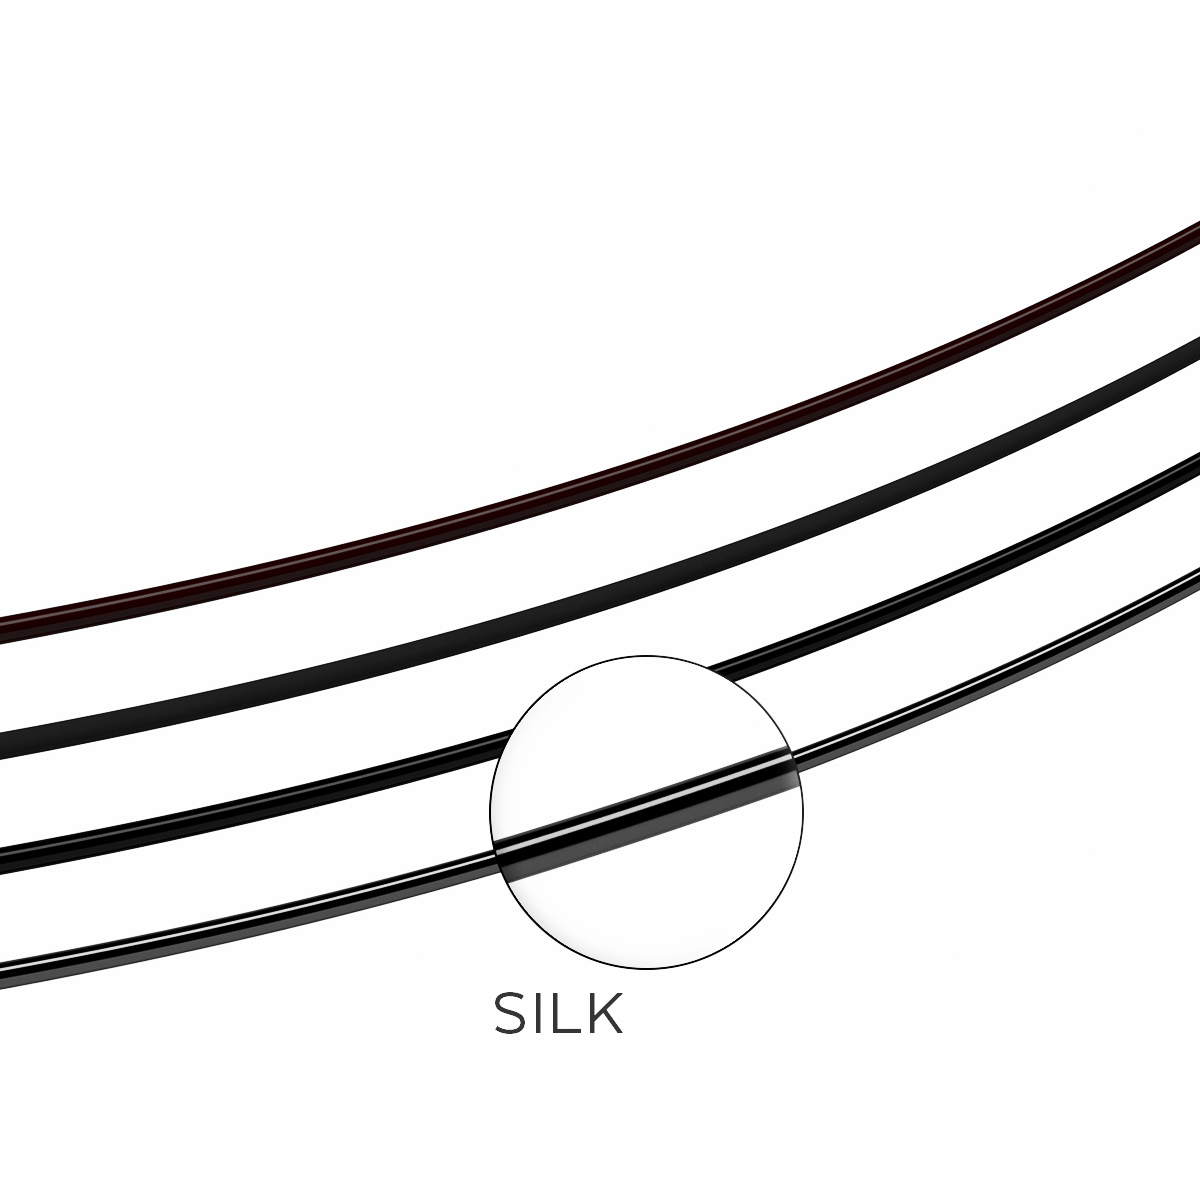 silk-black-c-0-15